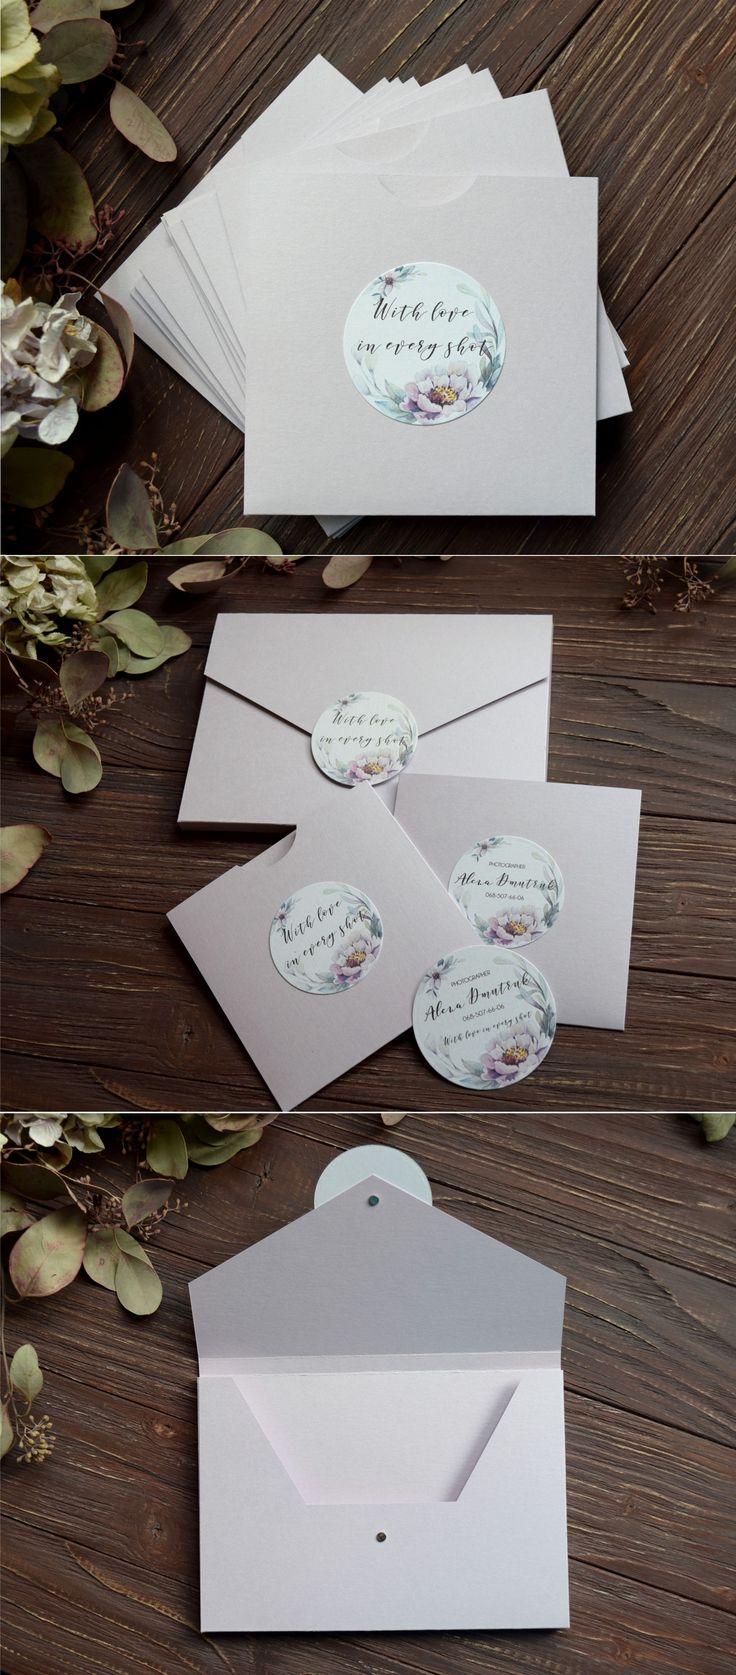 cd envelopes, envelopes for photos. Production for photographers.  Конверты для дисков, конверты для фото.  Продукция для фотографов https://www.vk.com/ks_box https://www.facebook.com/ks.designvision